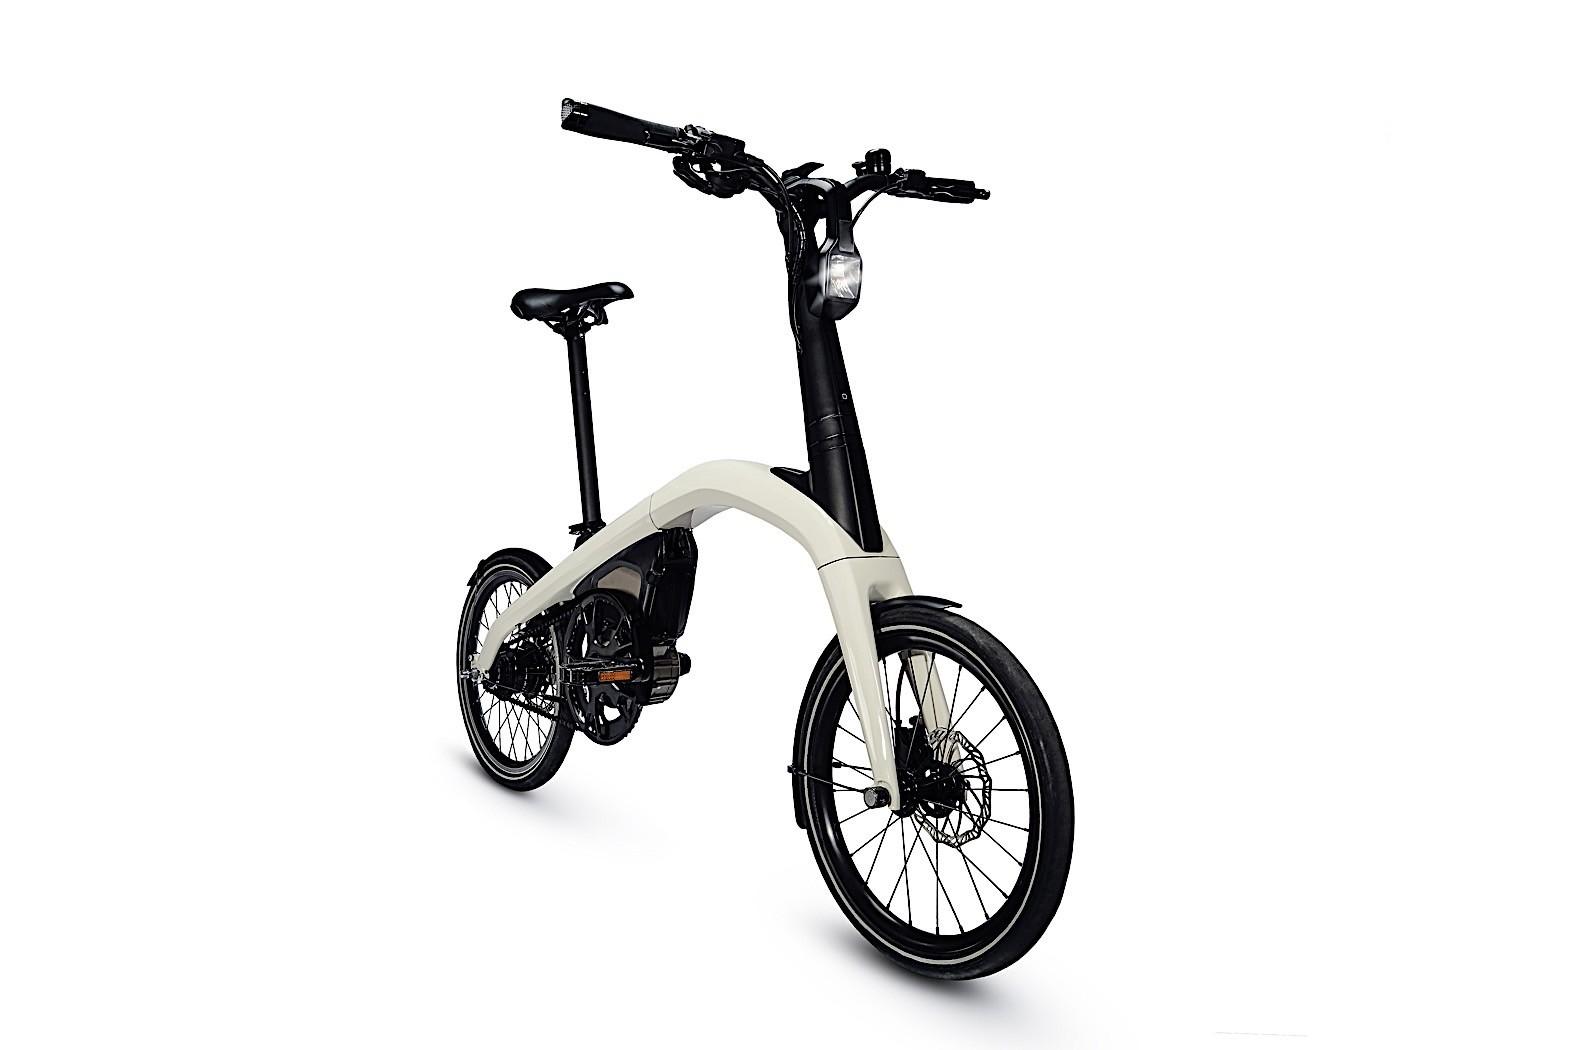 Wind Turbine Electric Motorcycles Are A Bit Unicorn Ish